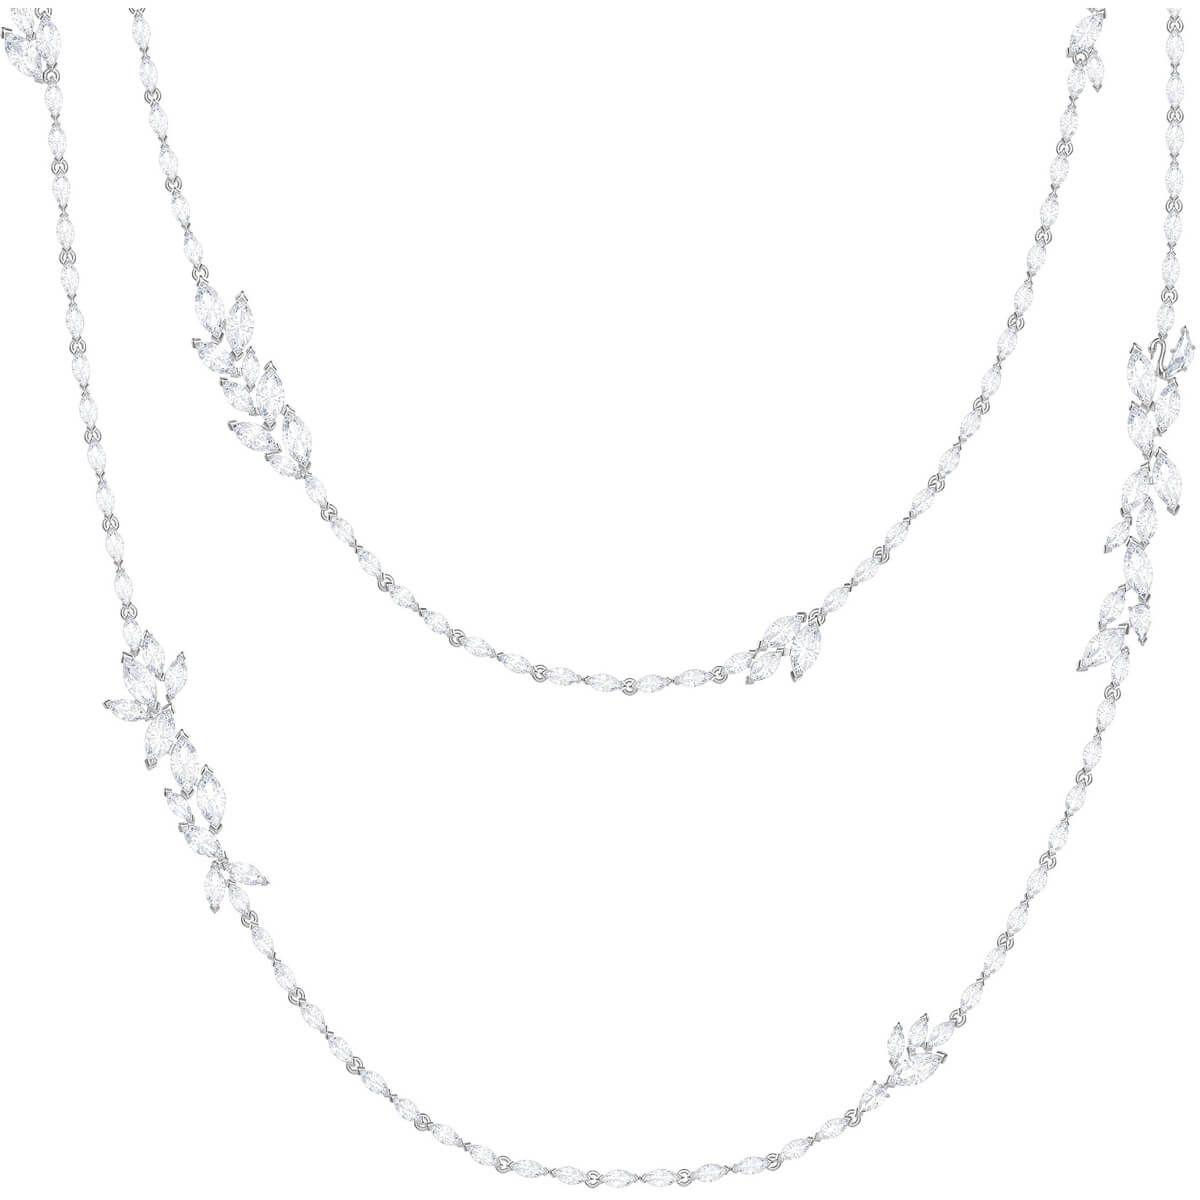 b6c82af4d Louison Strandage, White, Rhodium plating | Jewelry in 2019 ...